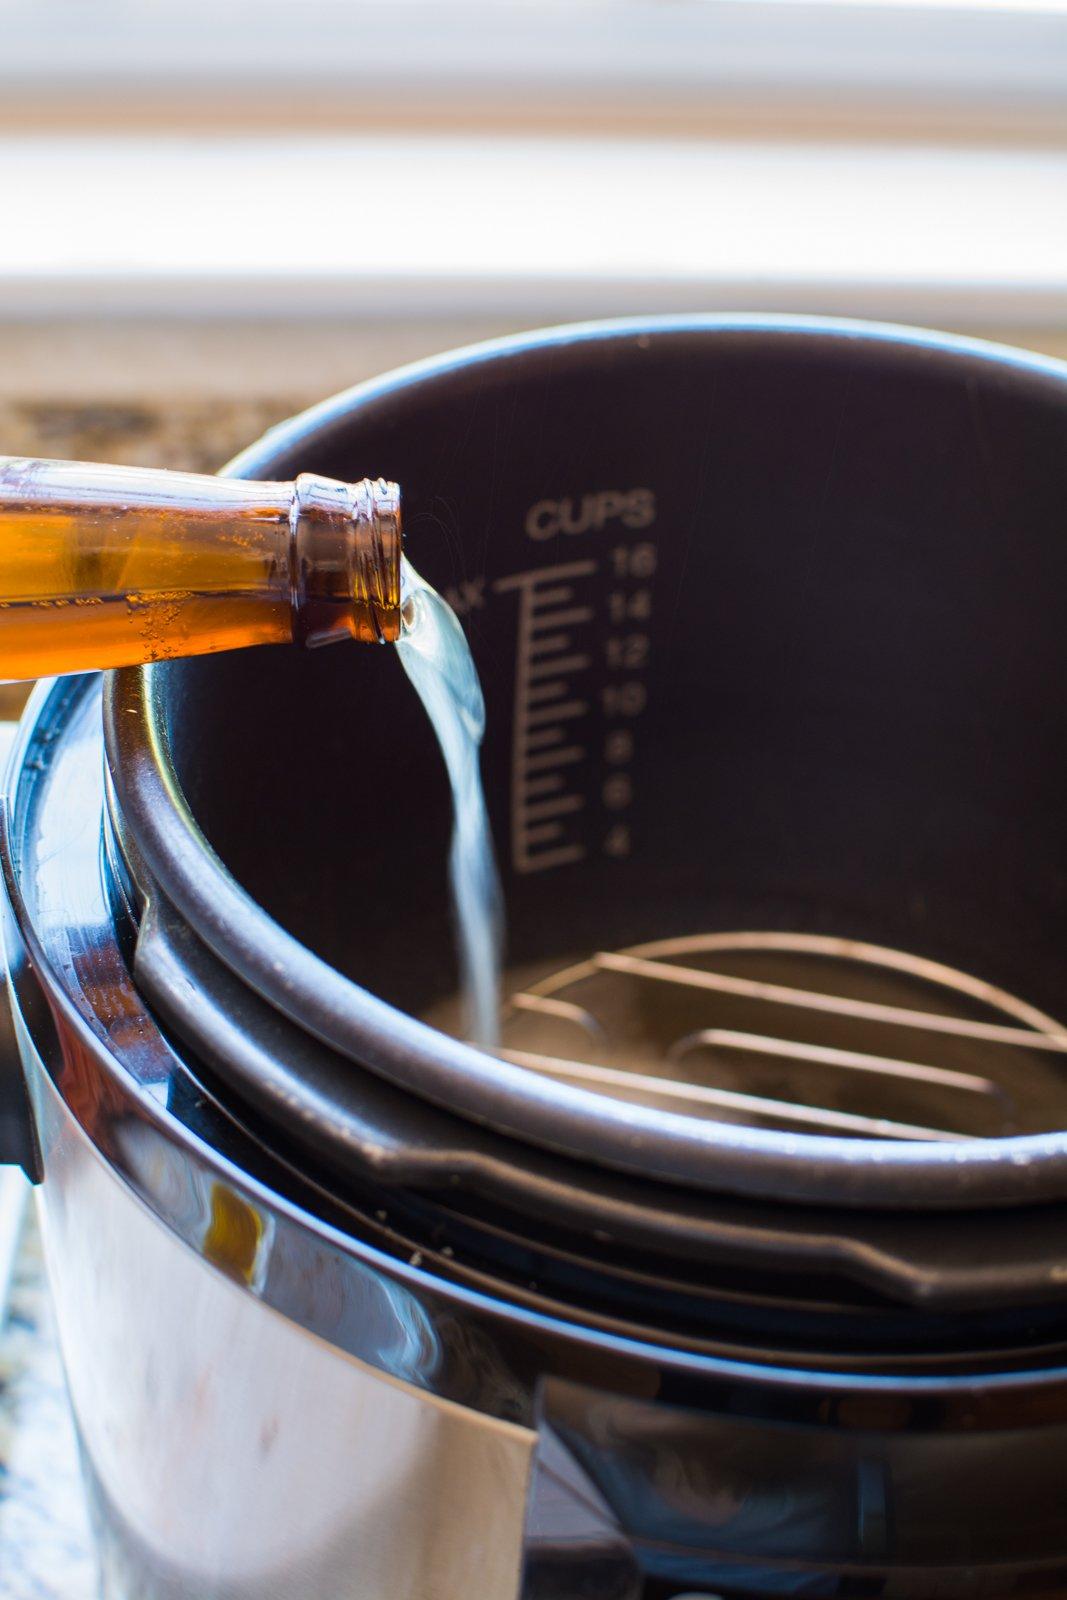 DSC 0201 - Apricot Ginger Beer Glazed Ribs